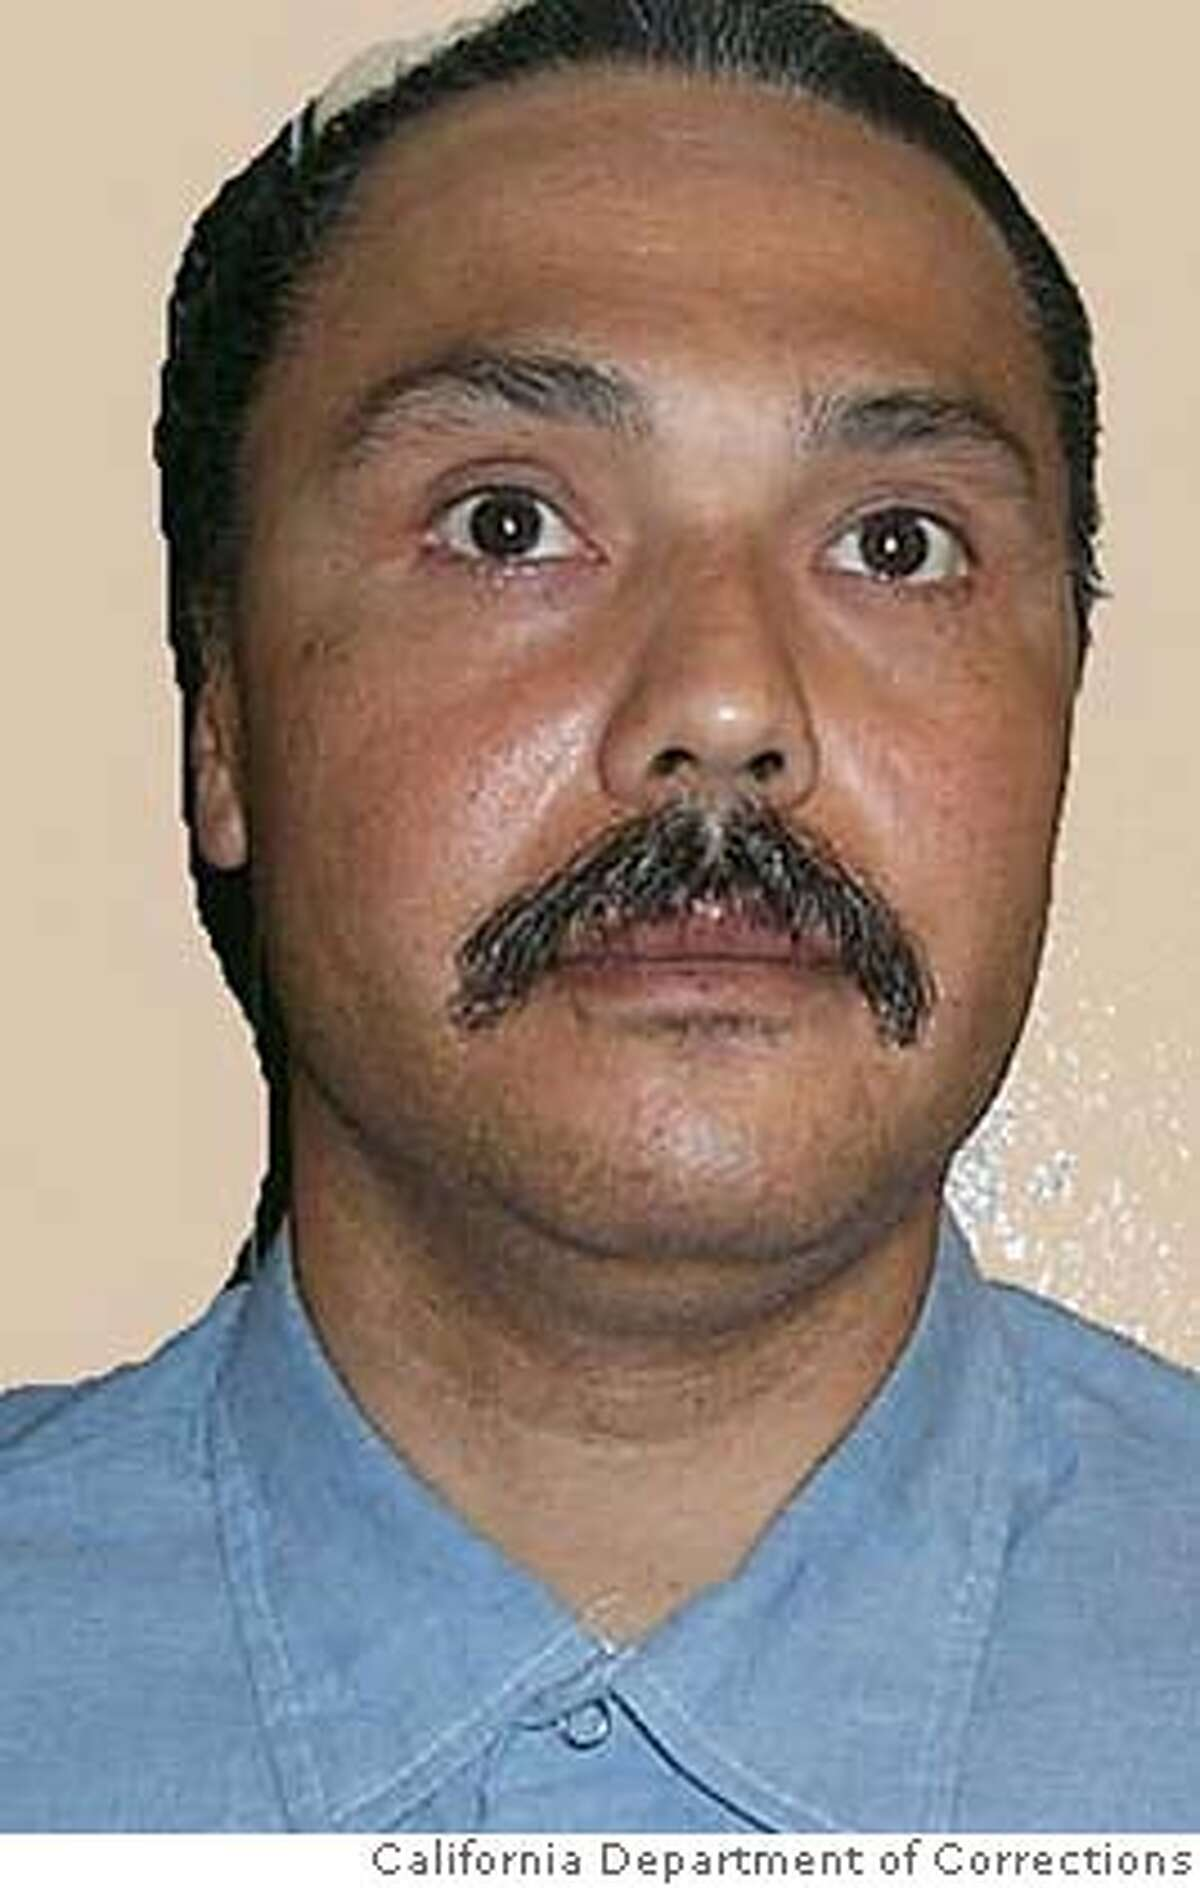 Michael Morales. California Department of Corrections Photo